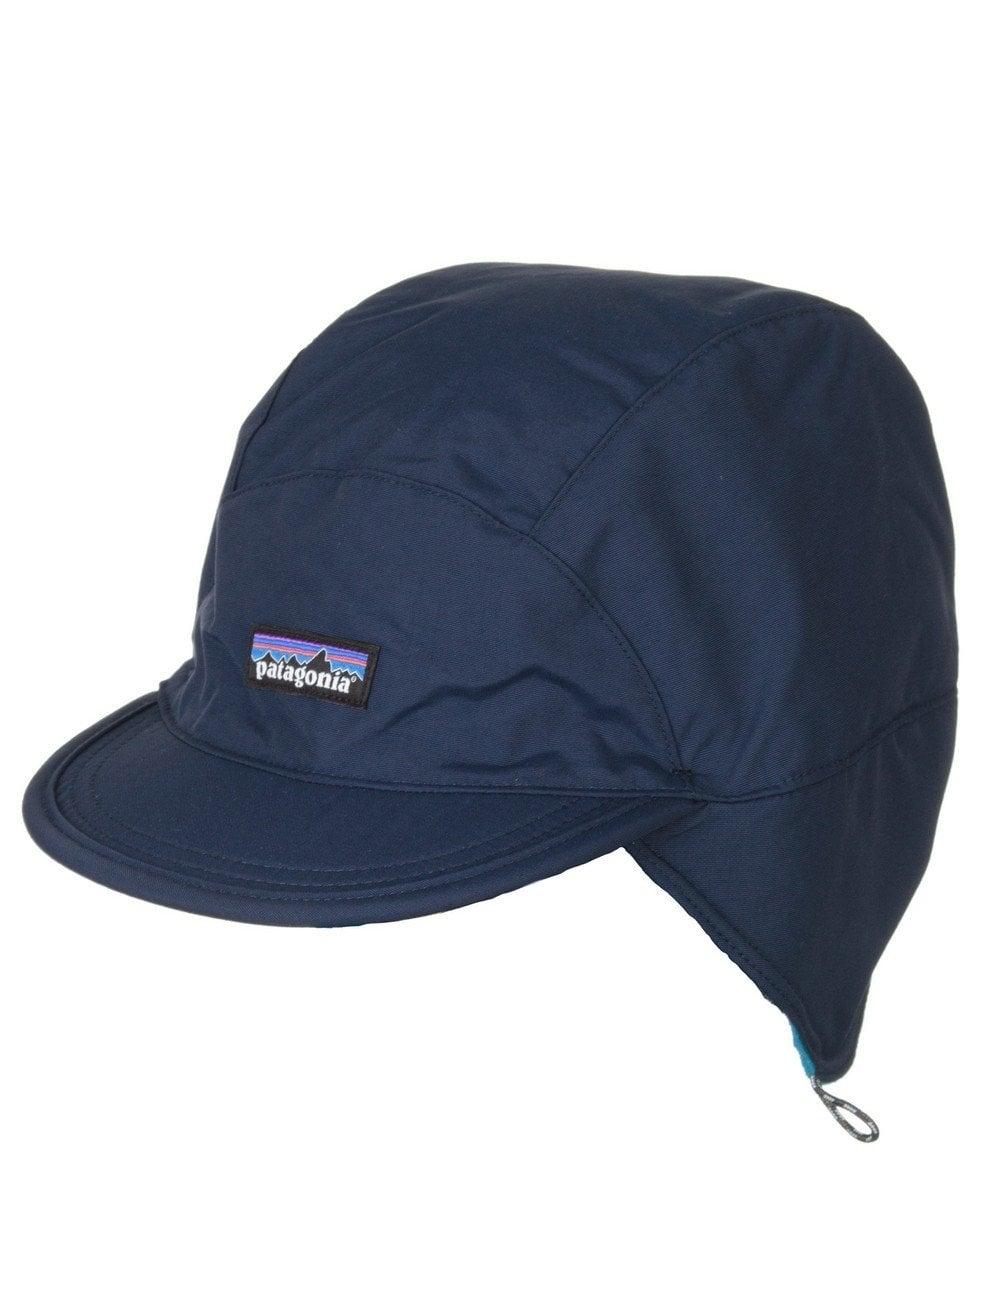 Patagonia Shelled Synchilla Duckbill Cap - Navy Blue - Accessories ... d81f37b2ae0